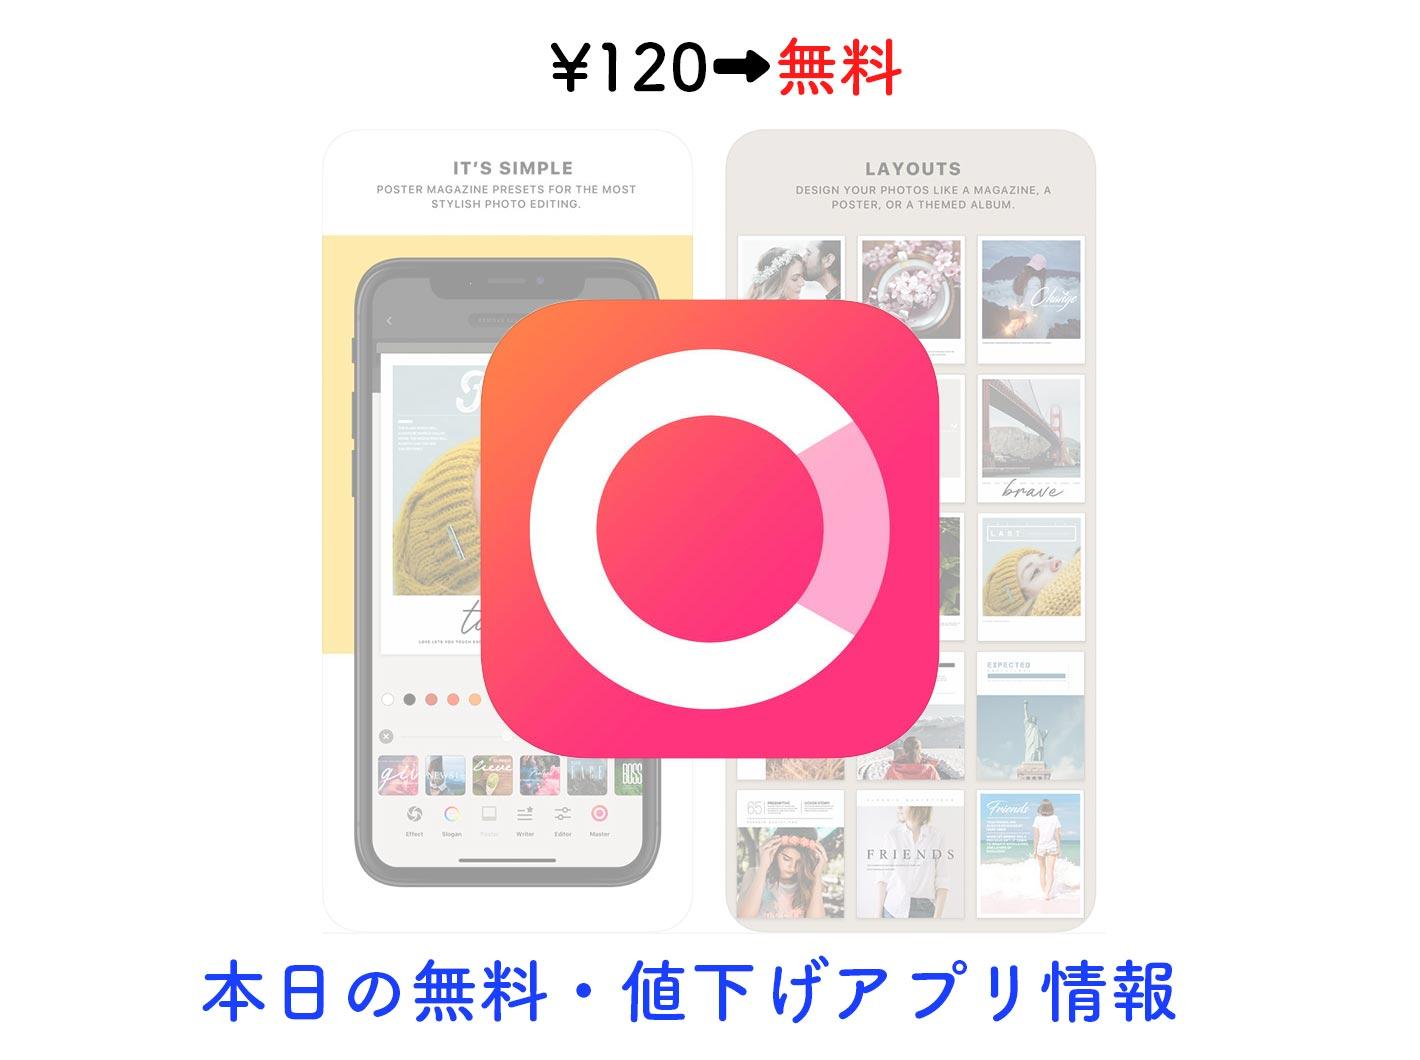 Appsale0726